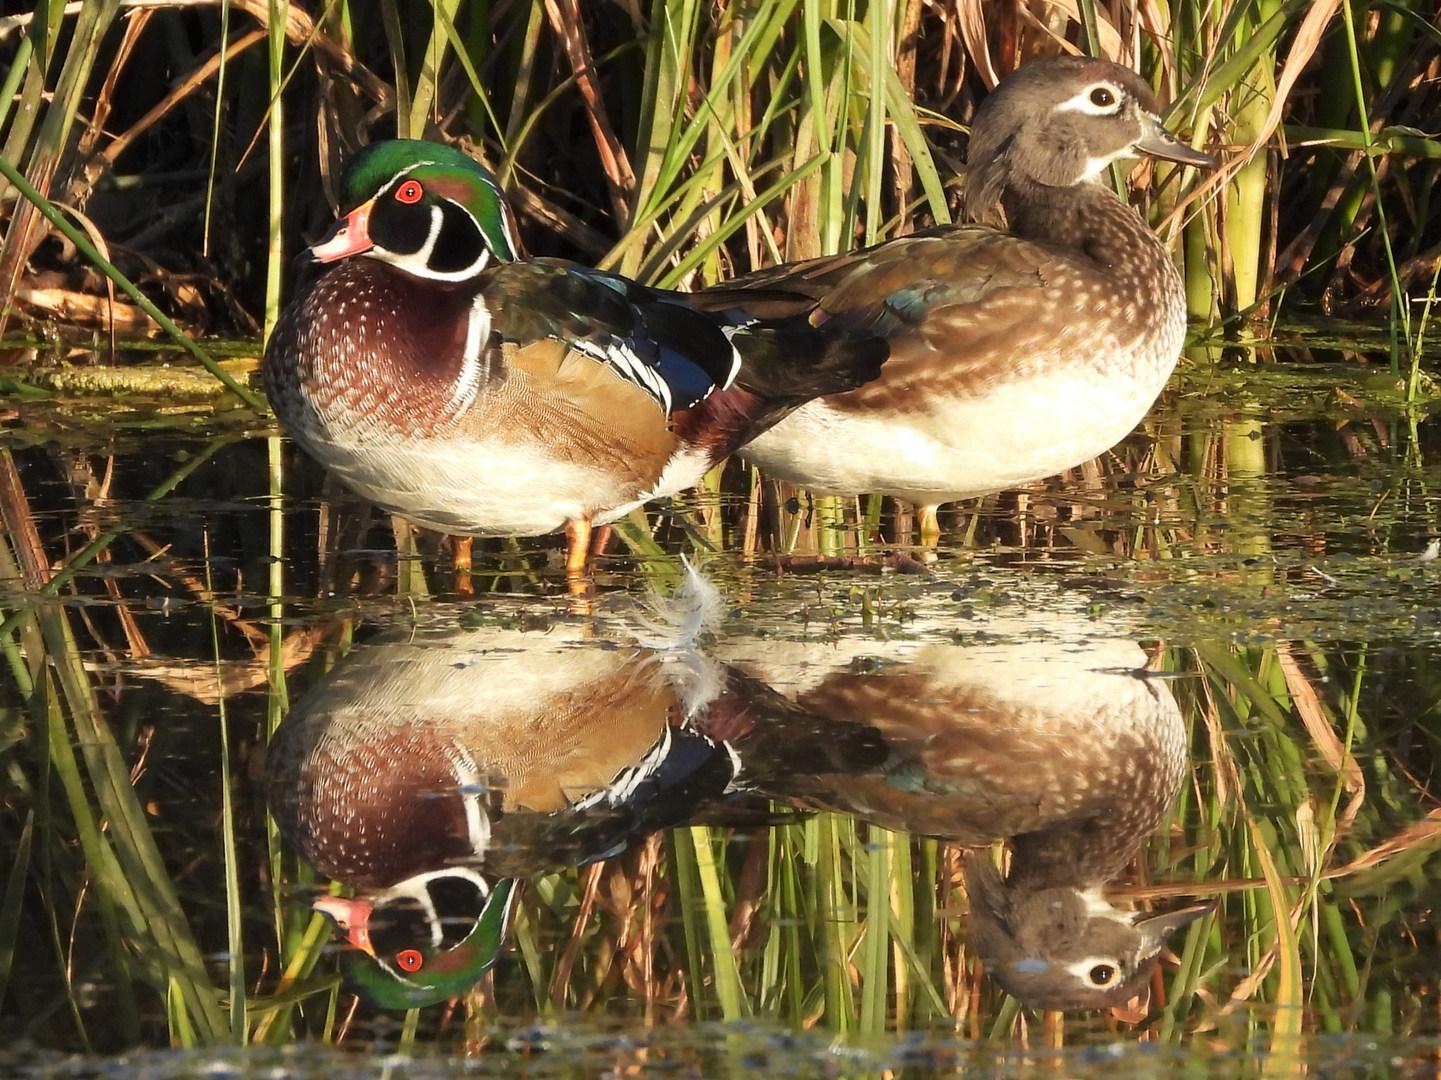 Wood duck pair Thompson 10-4-20 3.JPG